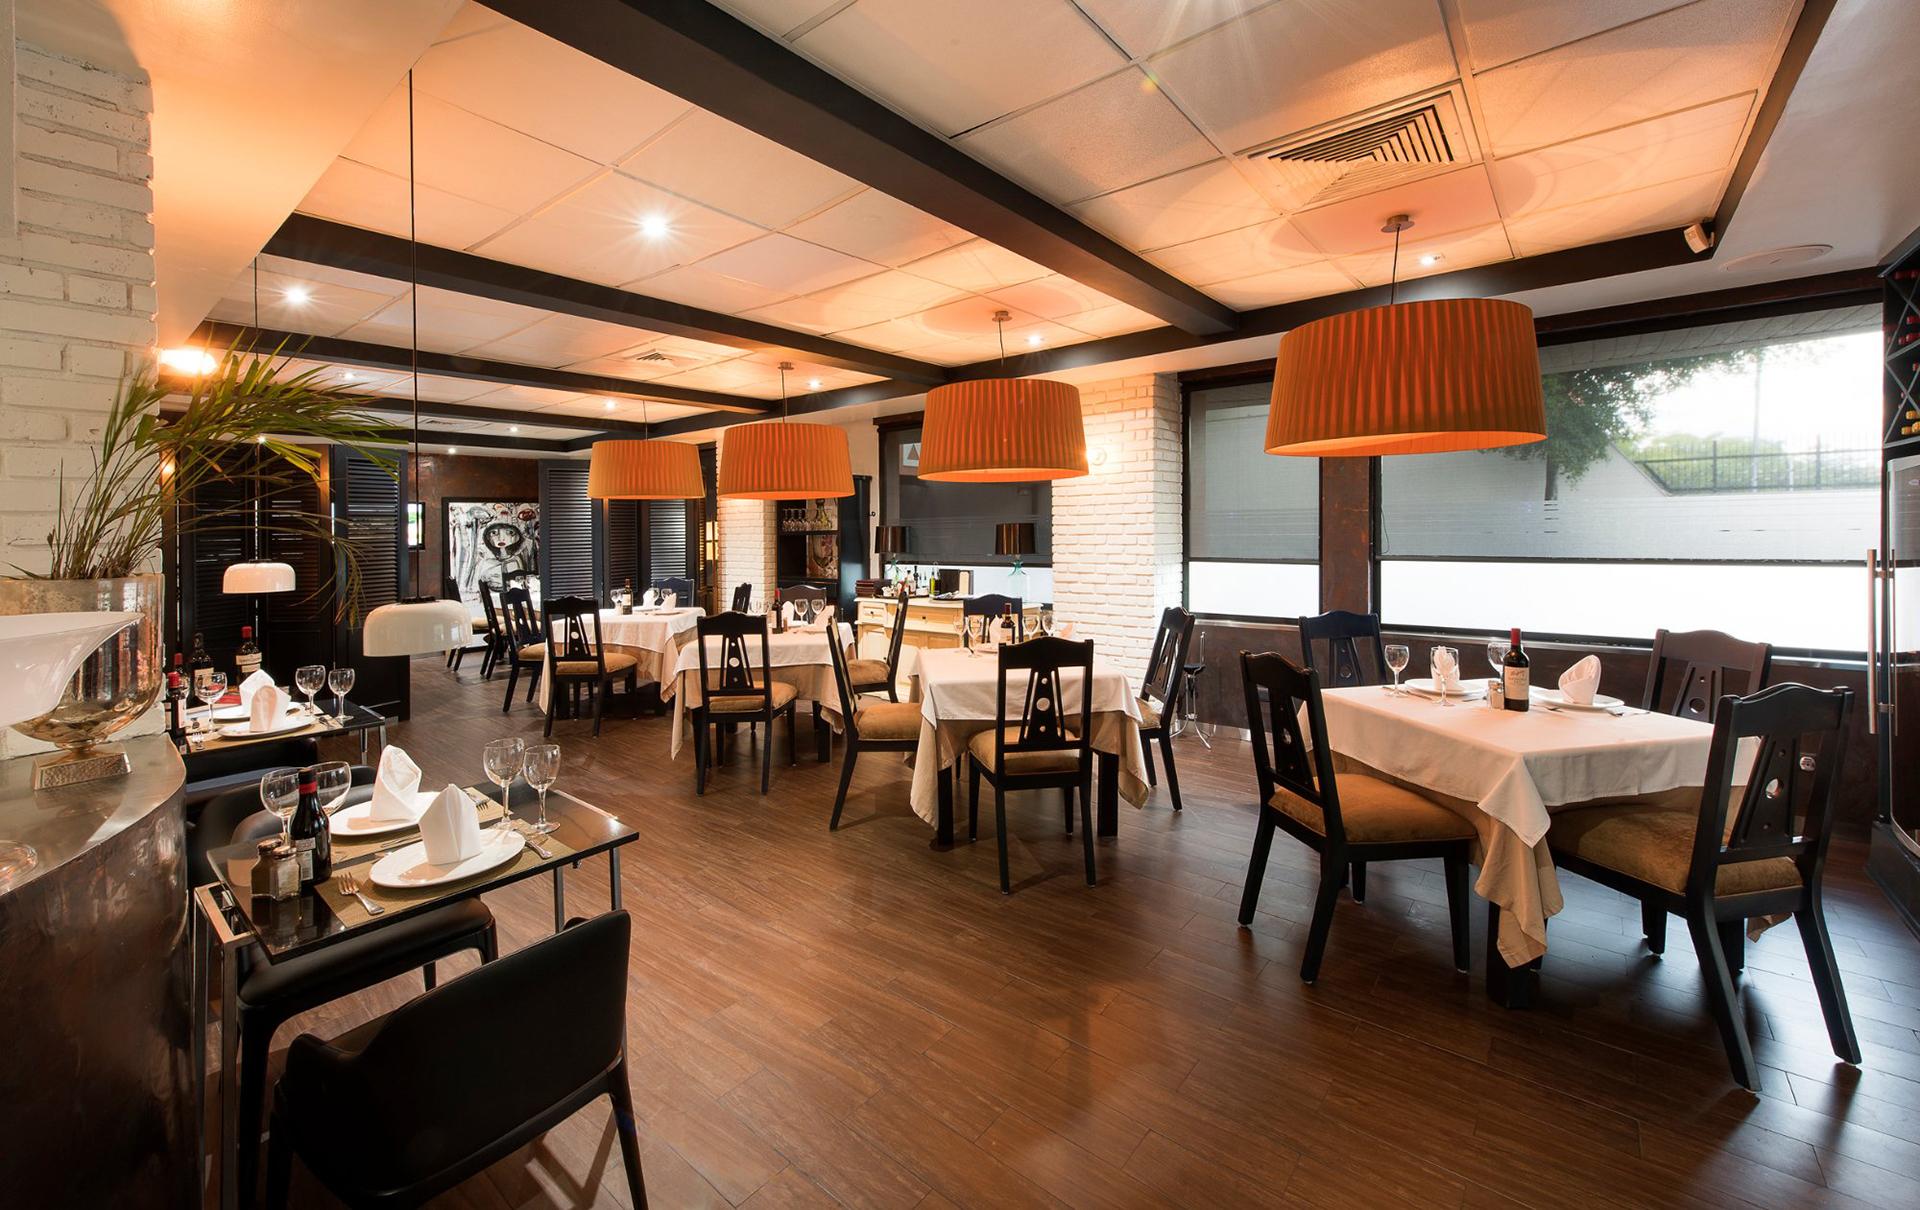 Restaurante Casa Vera Interior 02